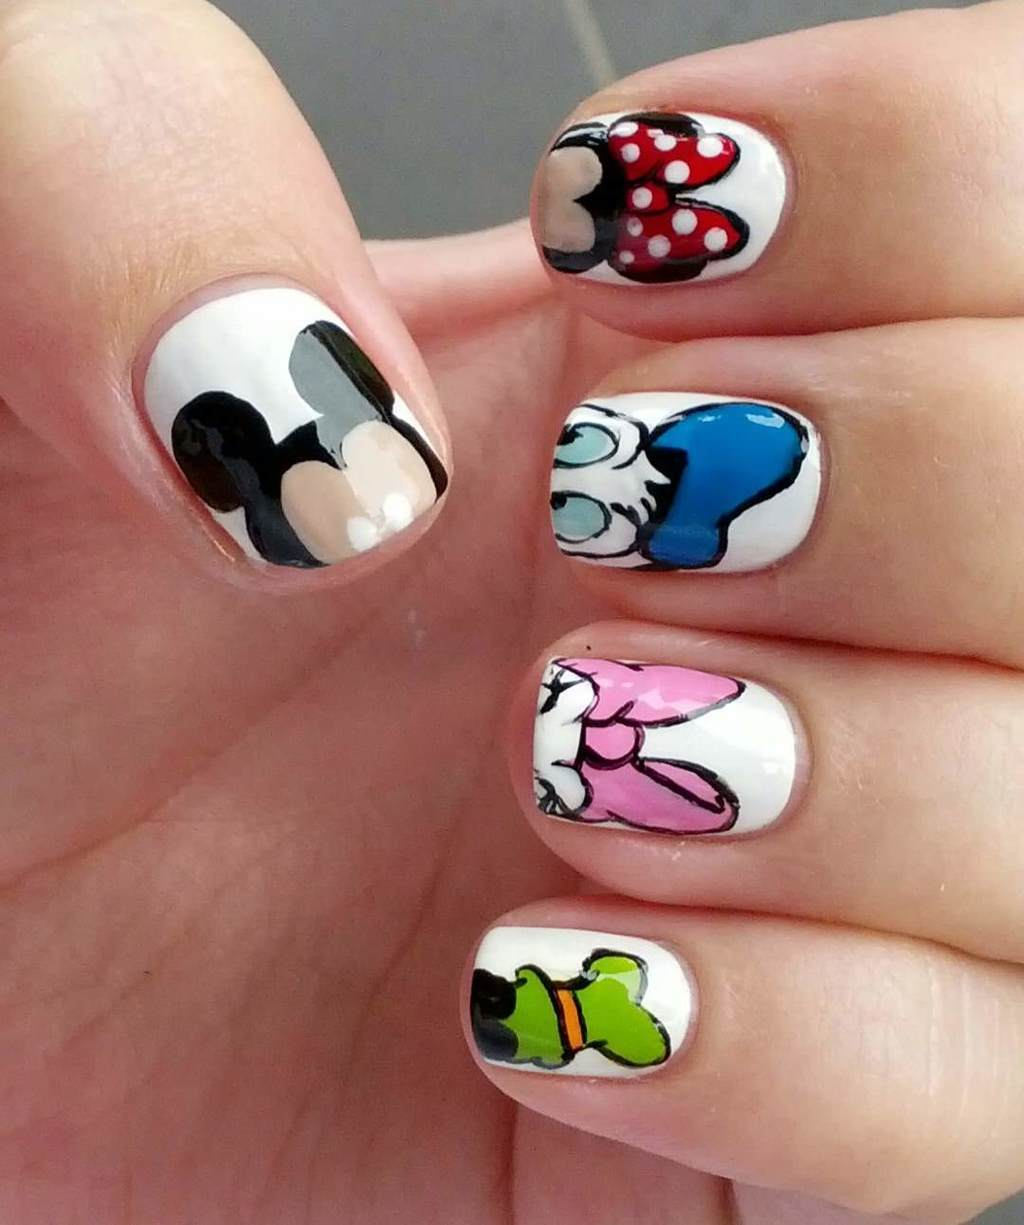 disney nail designs 9